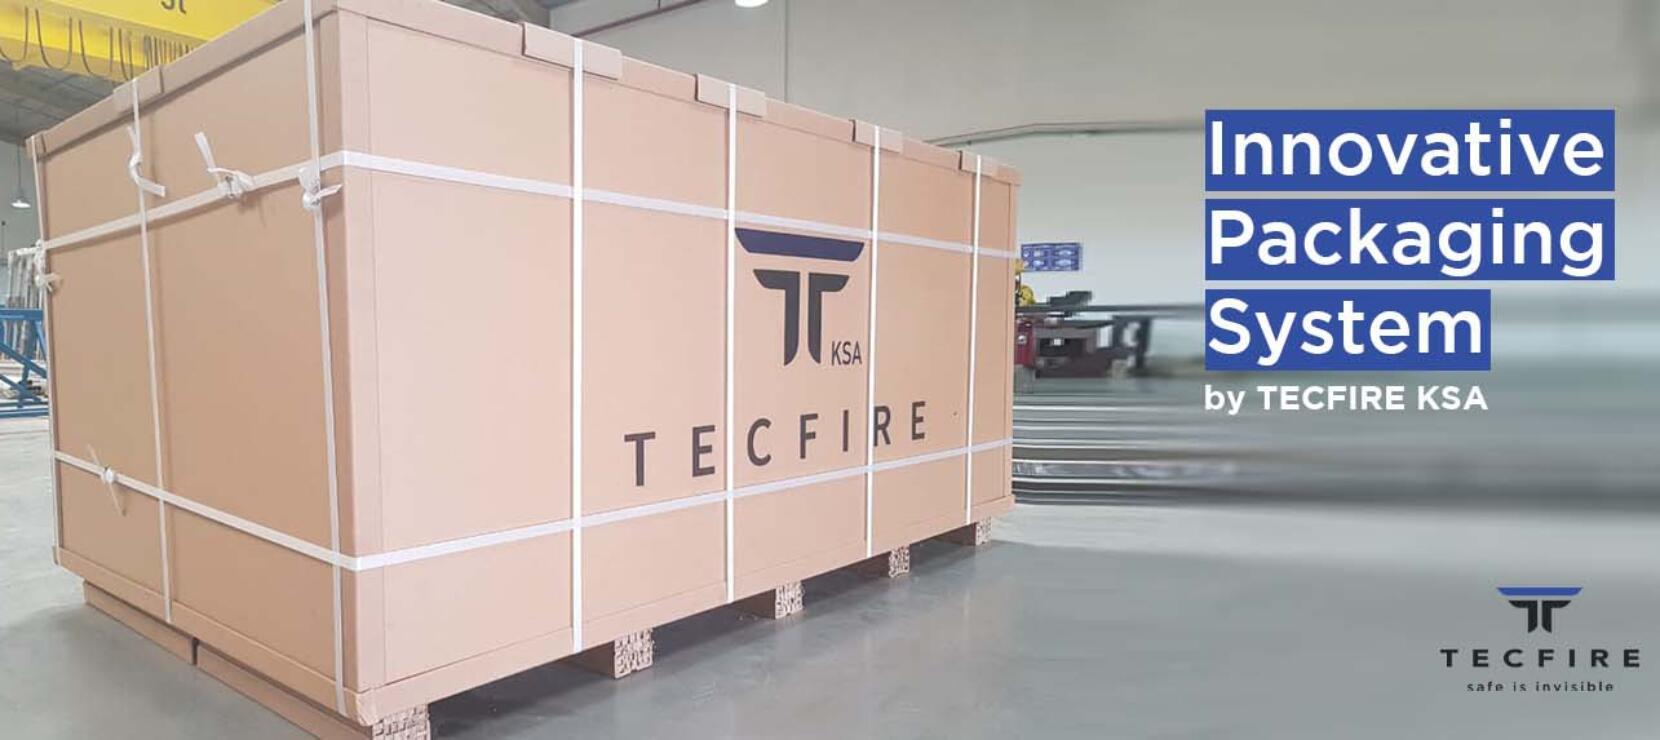 New & Innovative Packaging System developed by Tecfire KSA